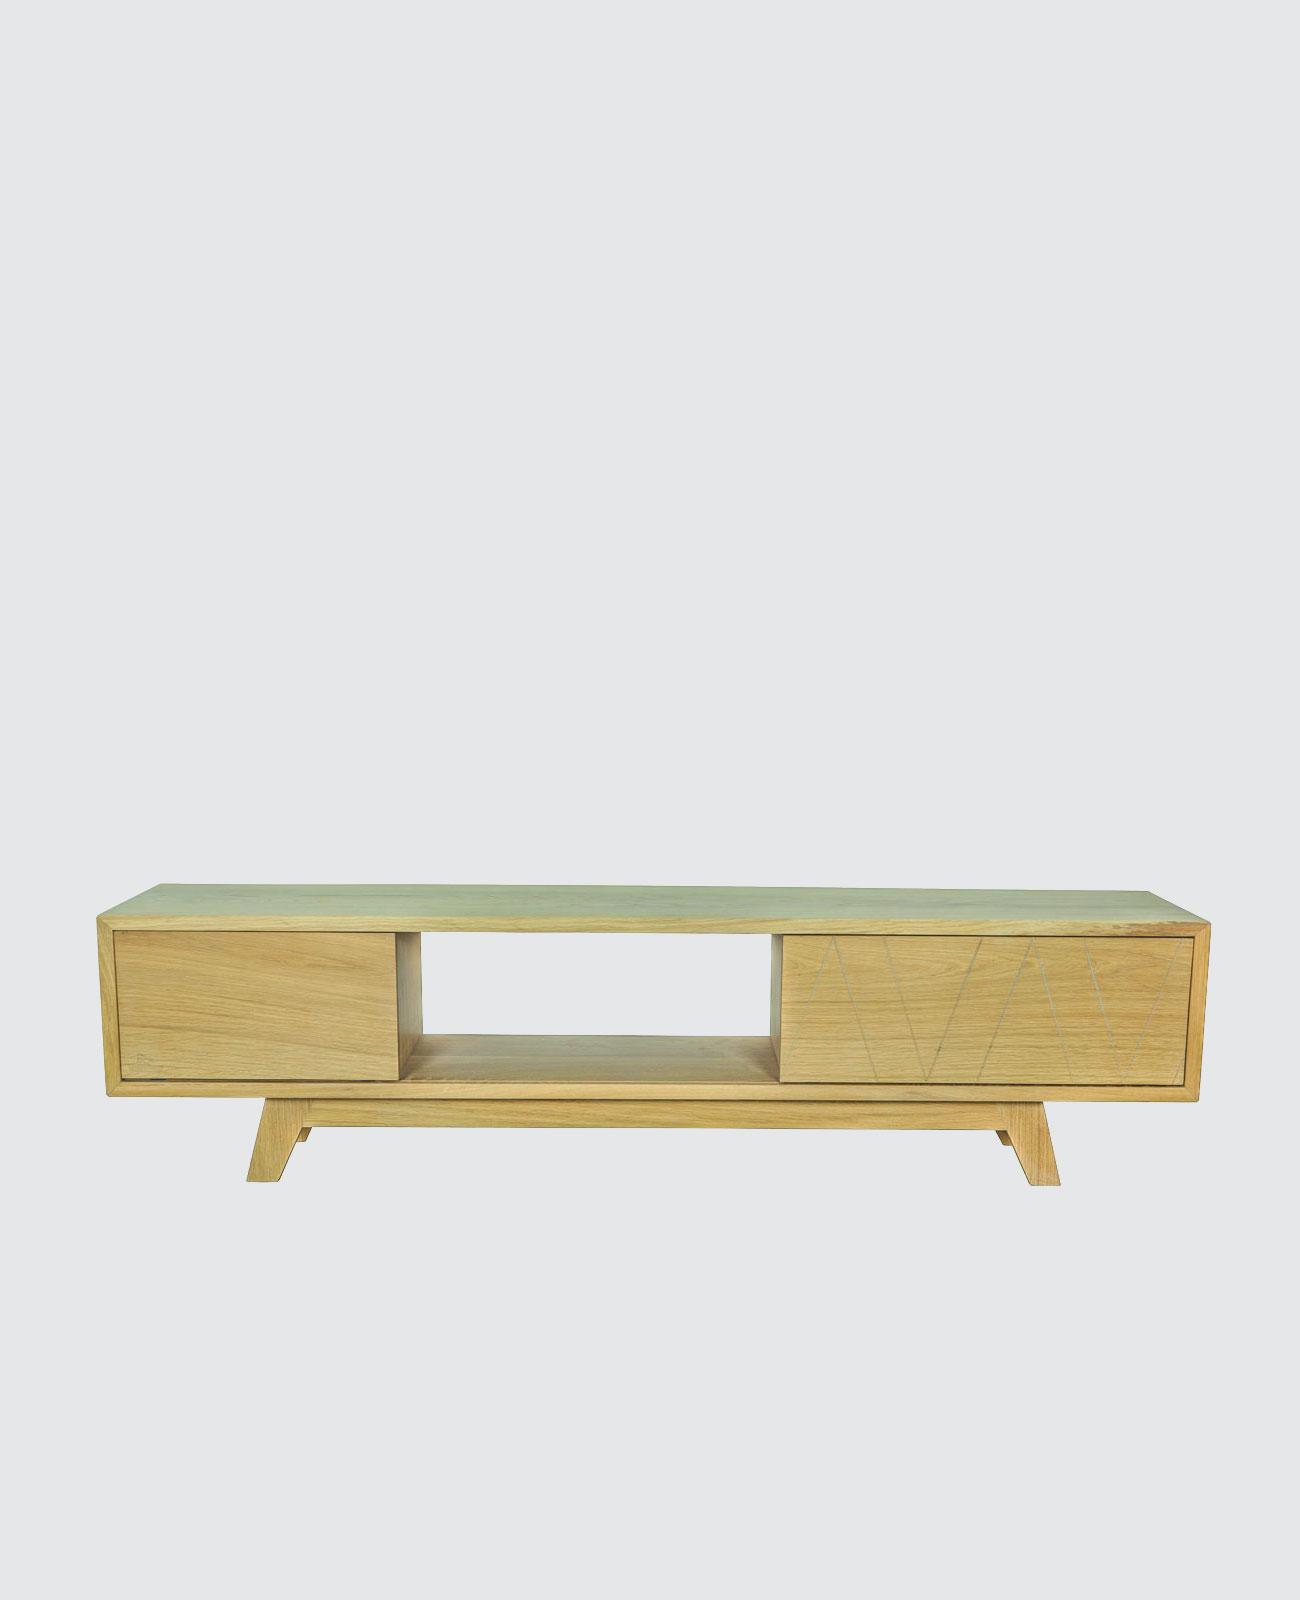 Meuble Tv Bois Massif Fran Ais Scandinave Design Wood Scrap # Meuble Tv Bois Massif